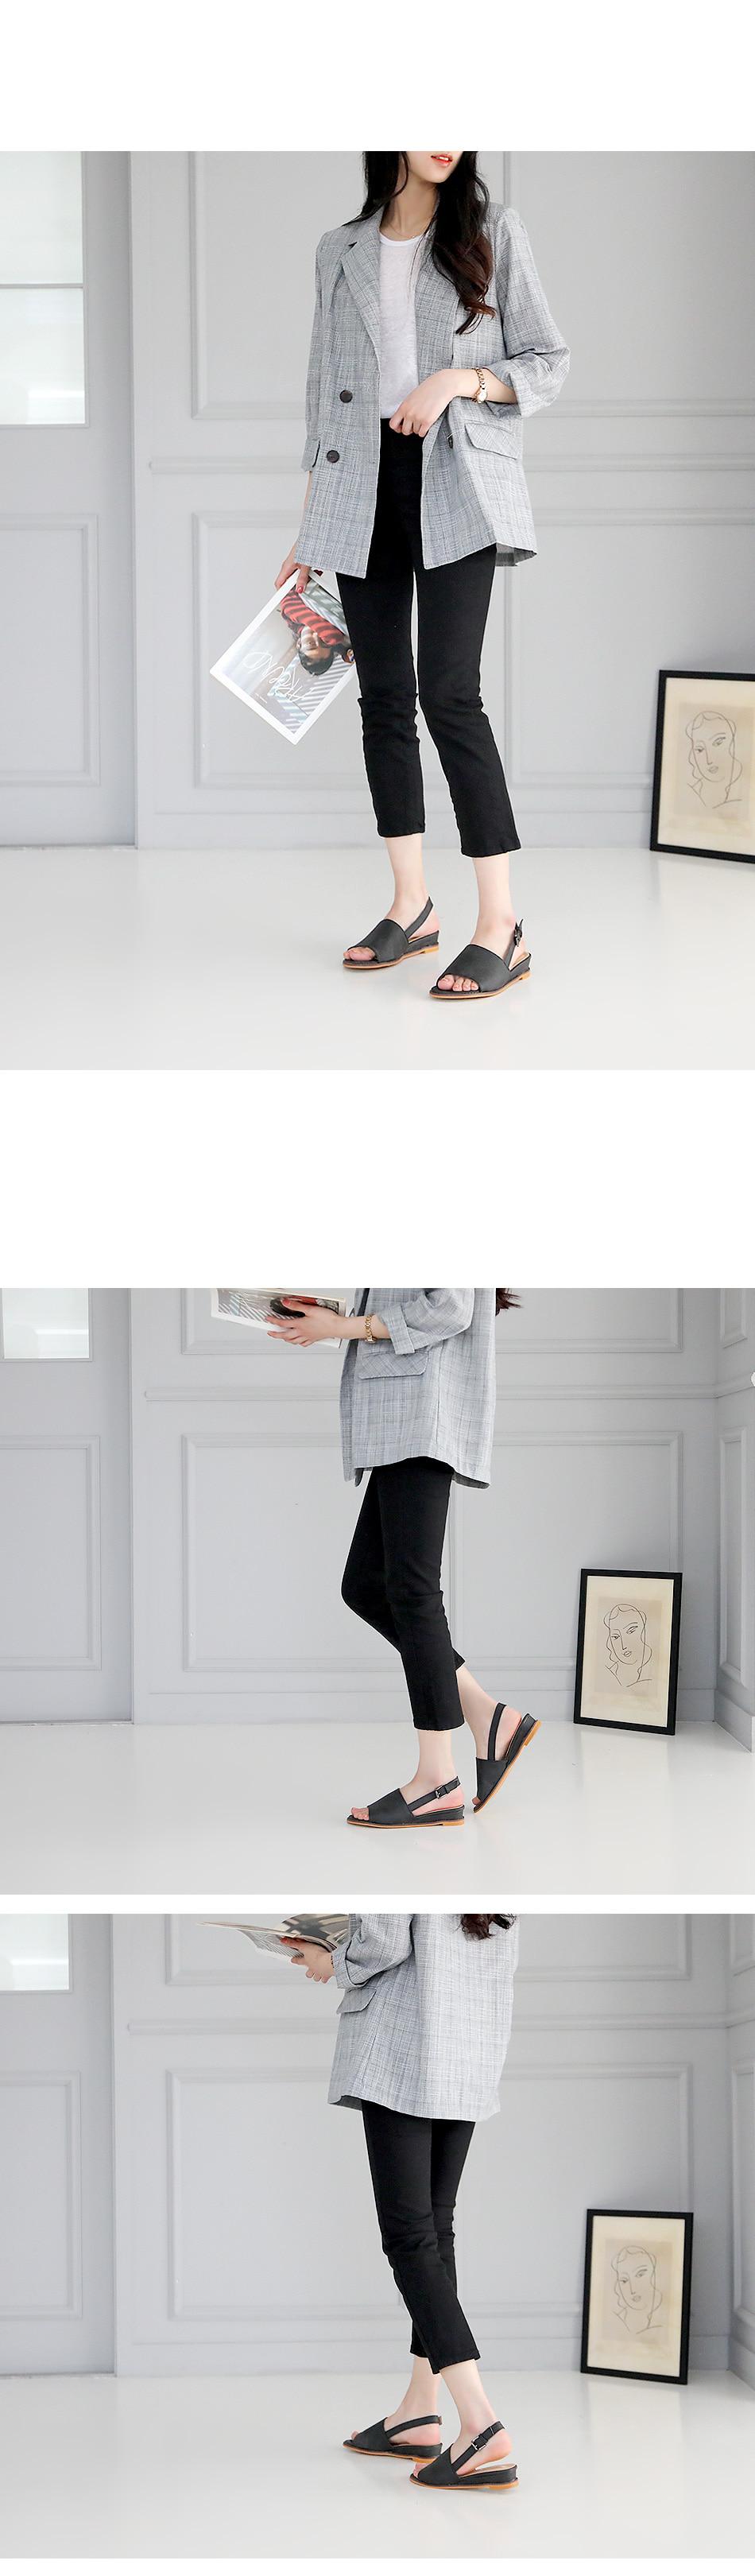 This dense slingback sandals 3cm